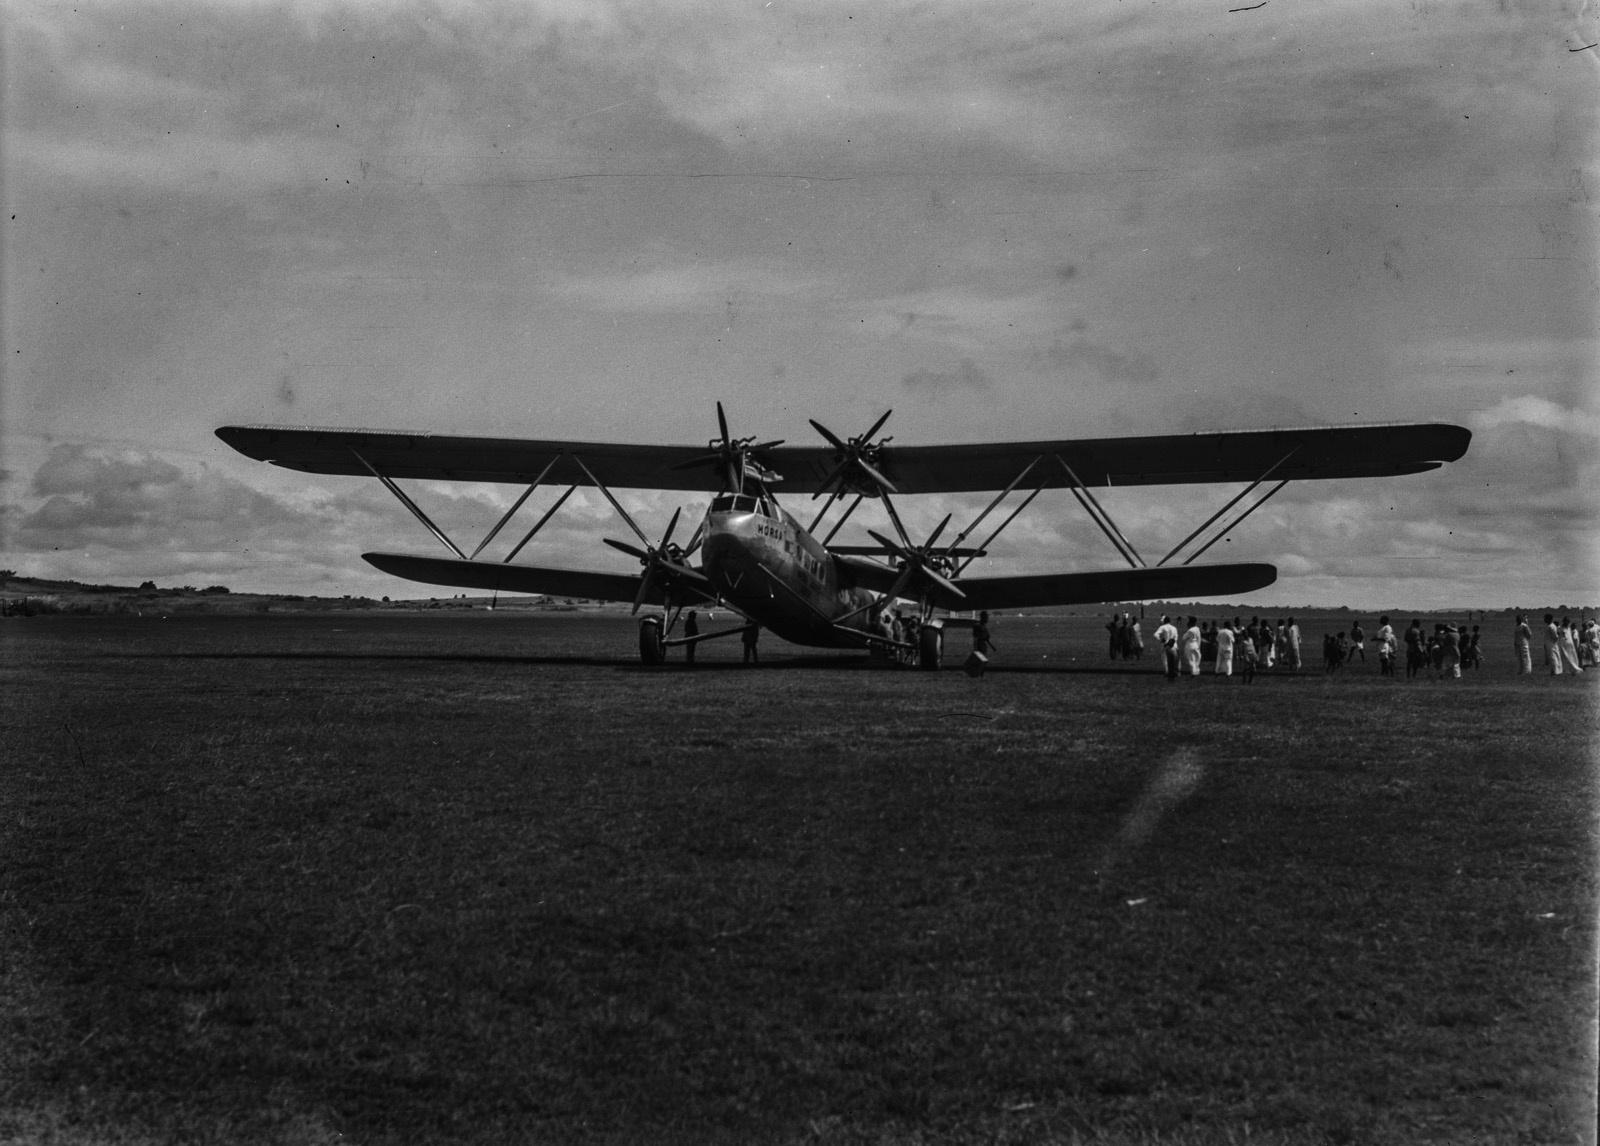 Озеро Виктория. Английский авиалайнер на аэродроме